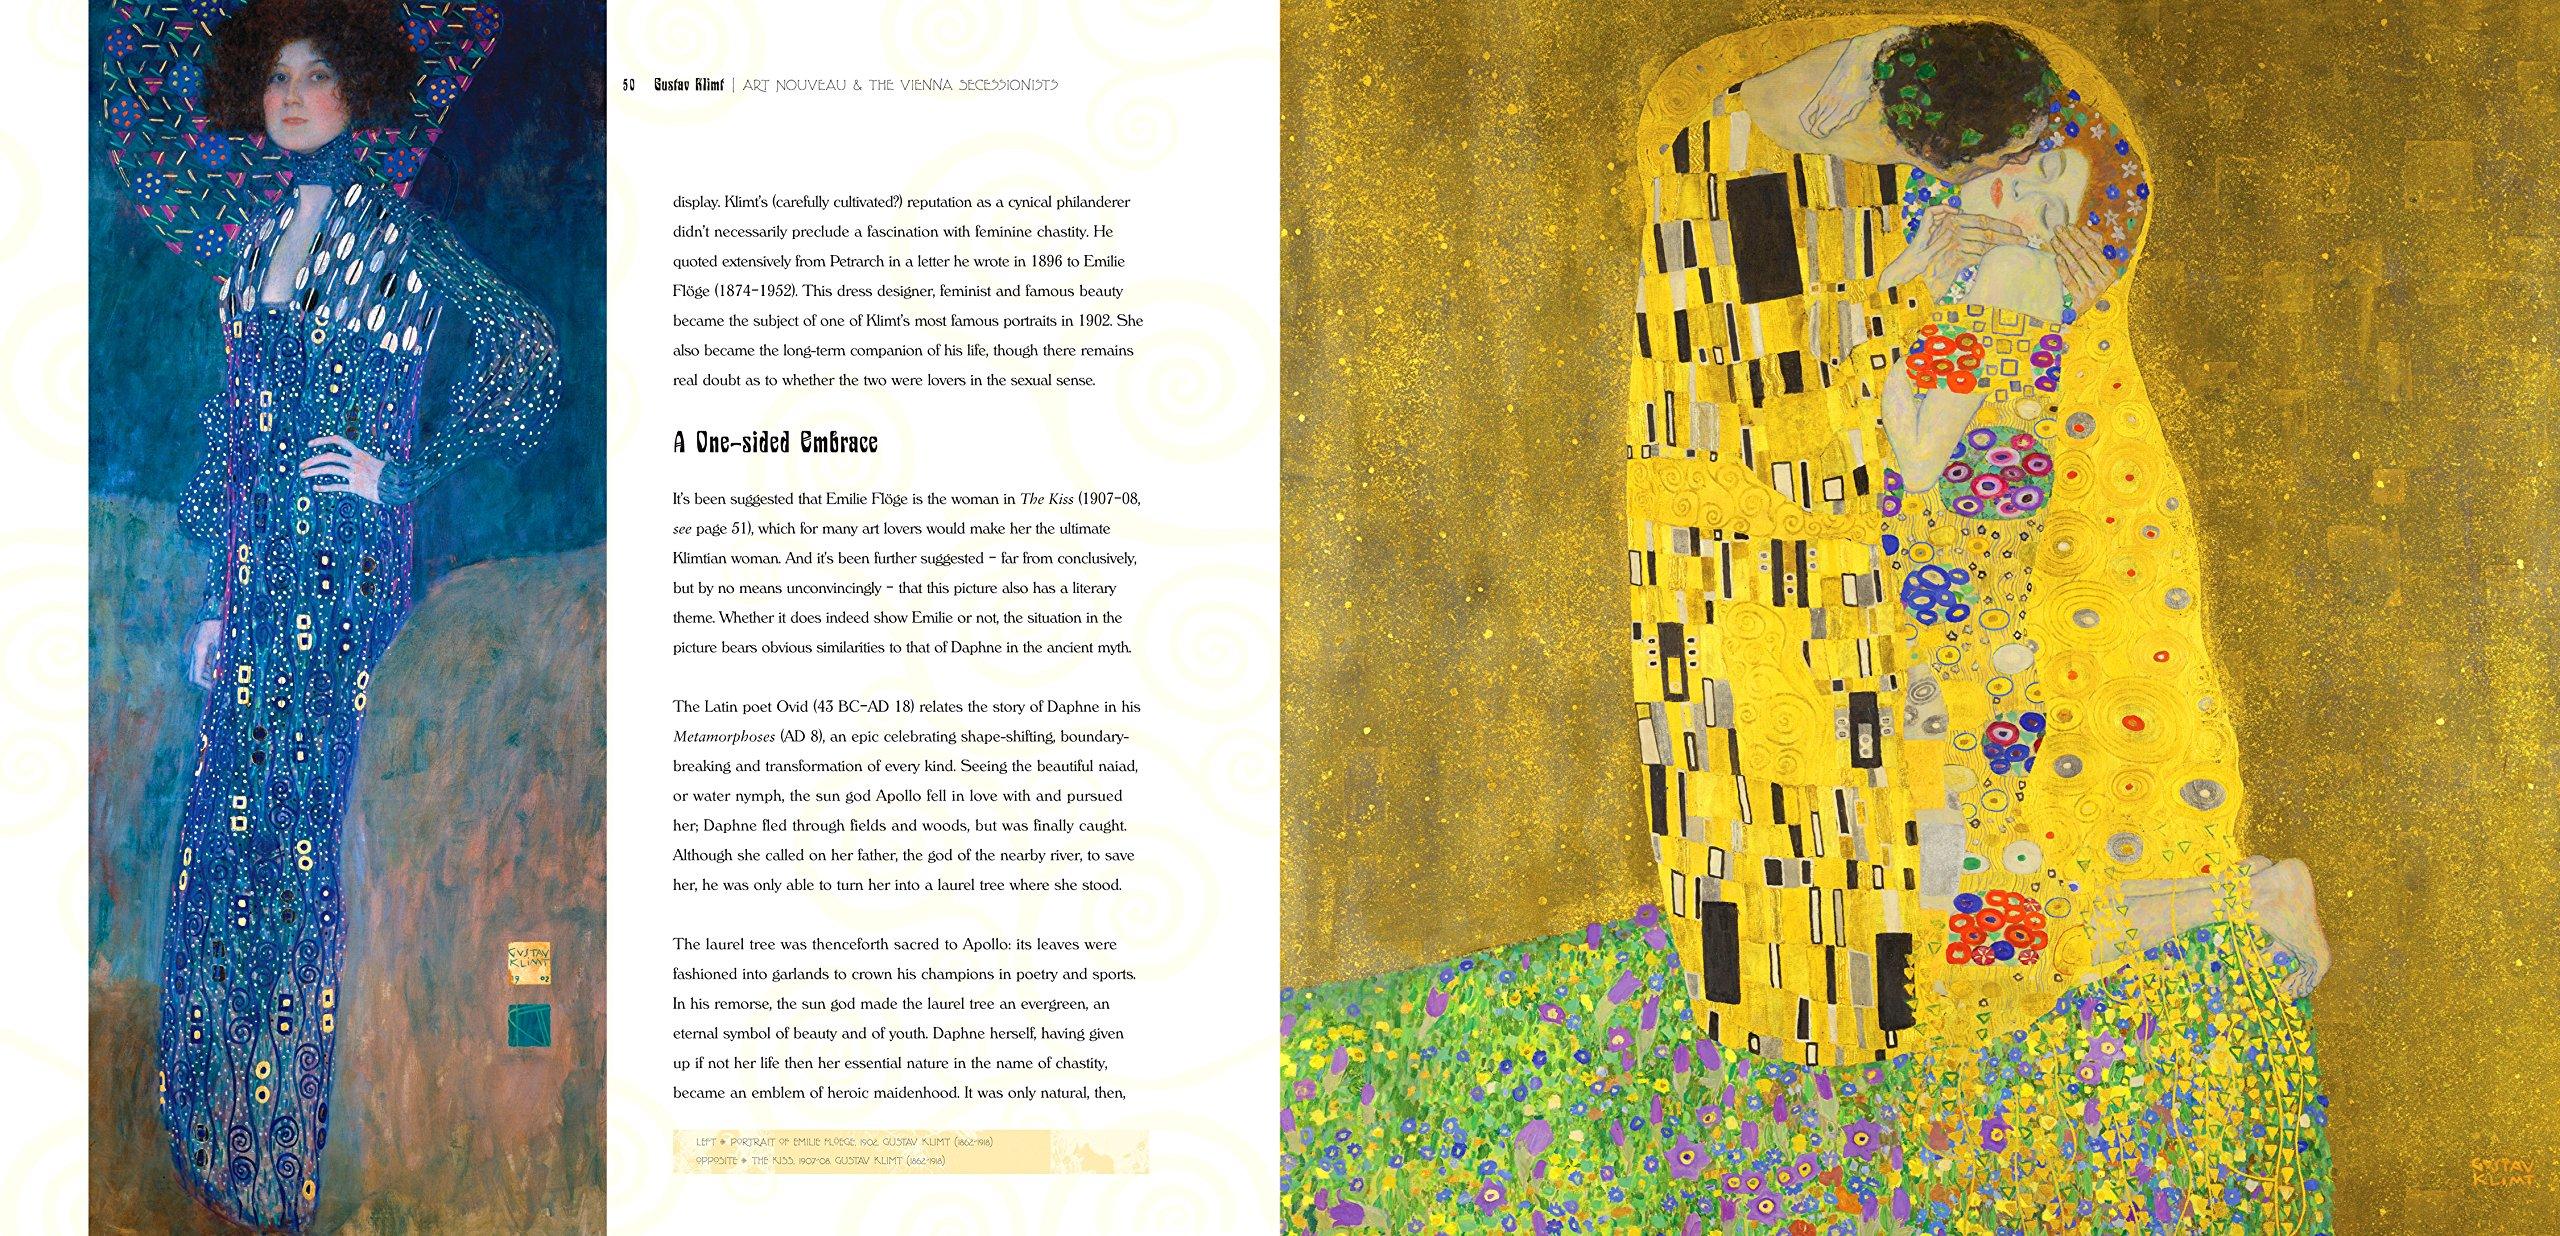 Gustav Klimt: Art Nouveau and the Vienna Secessionists (Masterworks):  Michael Kerrigan: 9781783616084: Amazon.com: Books